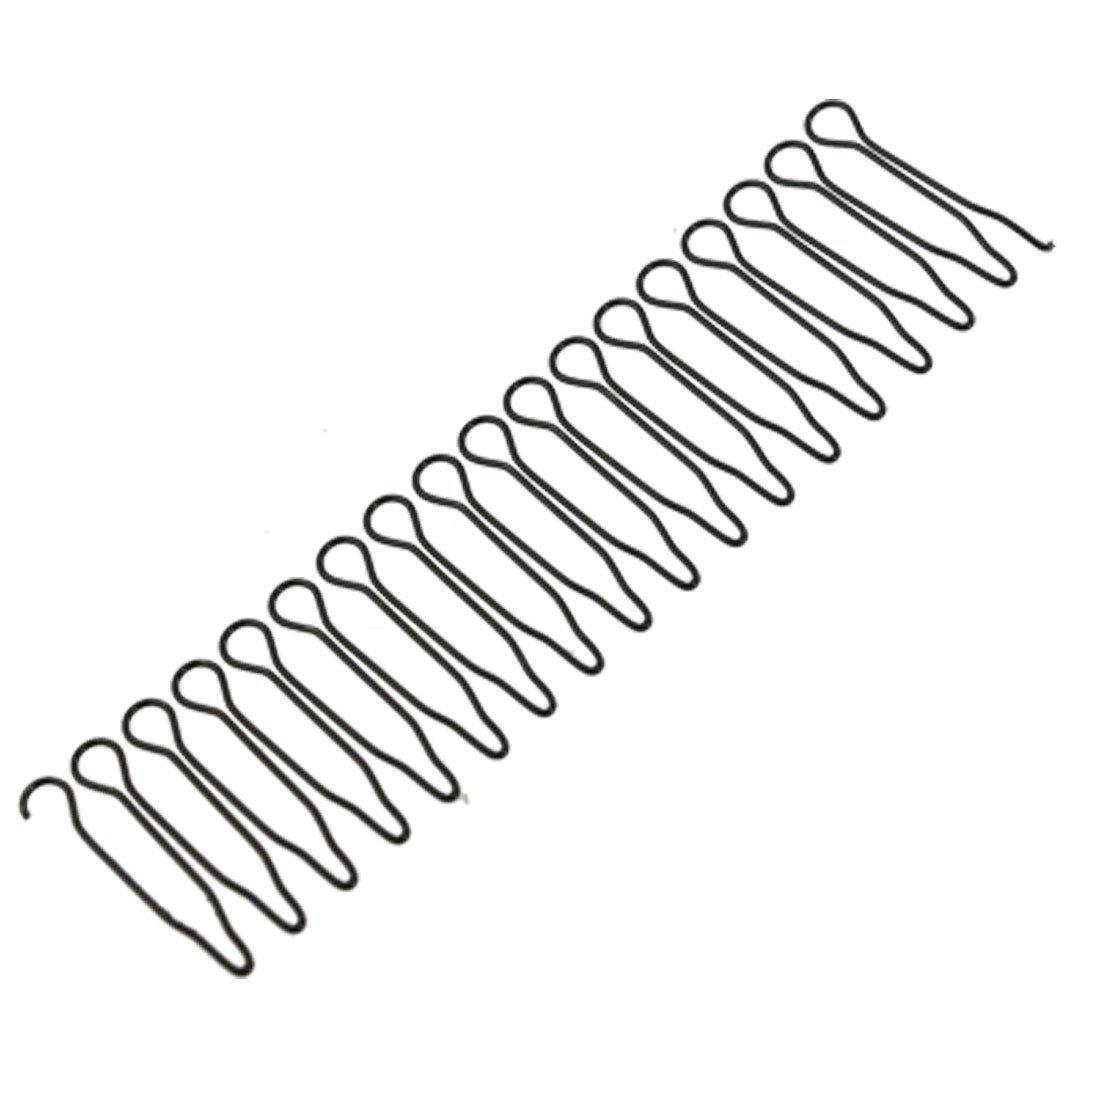 5 Pcs Black Metal Wave Wire Hoop Styling Flexible Headband